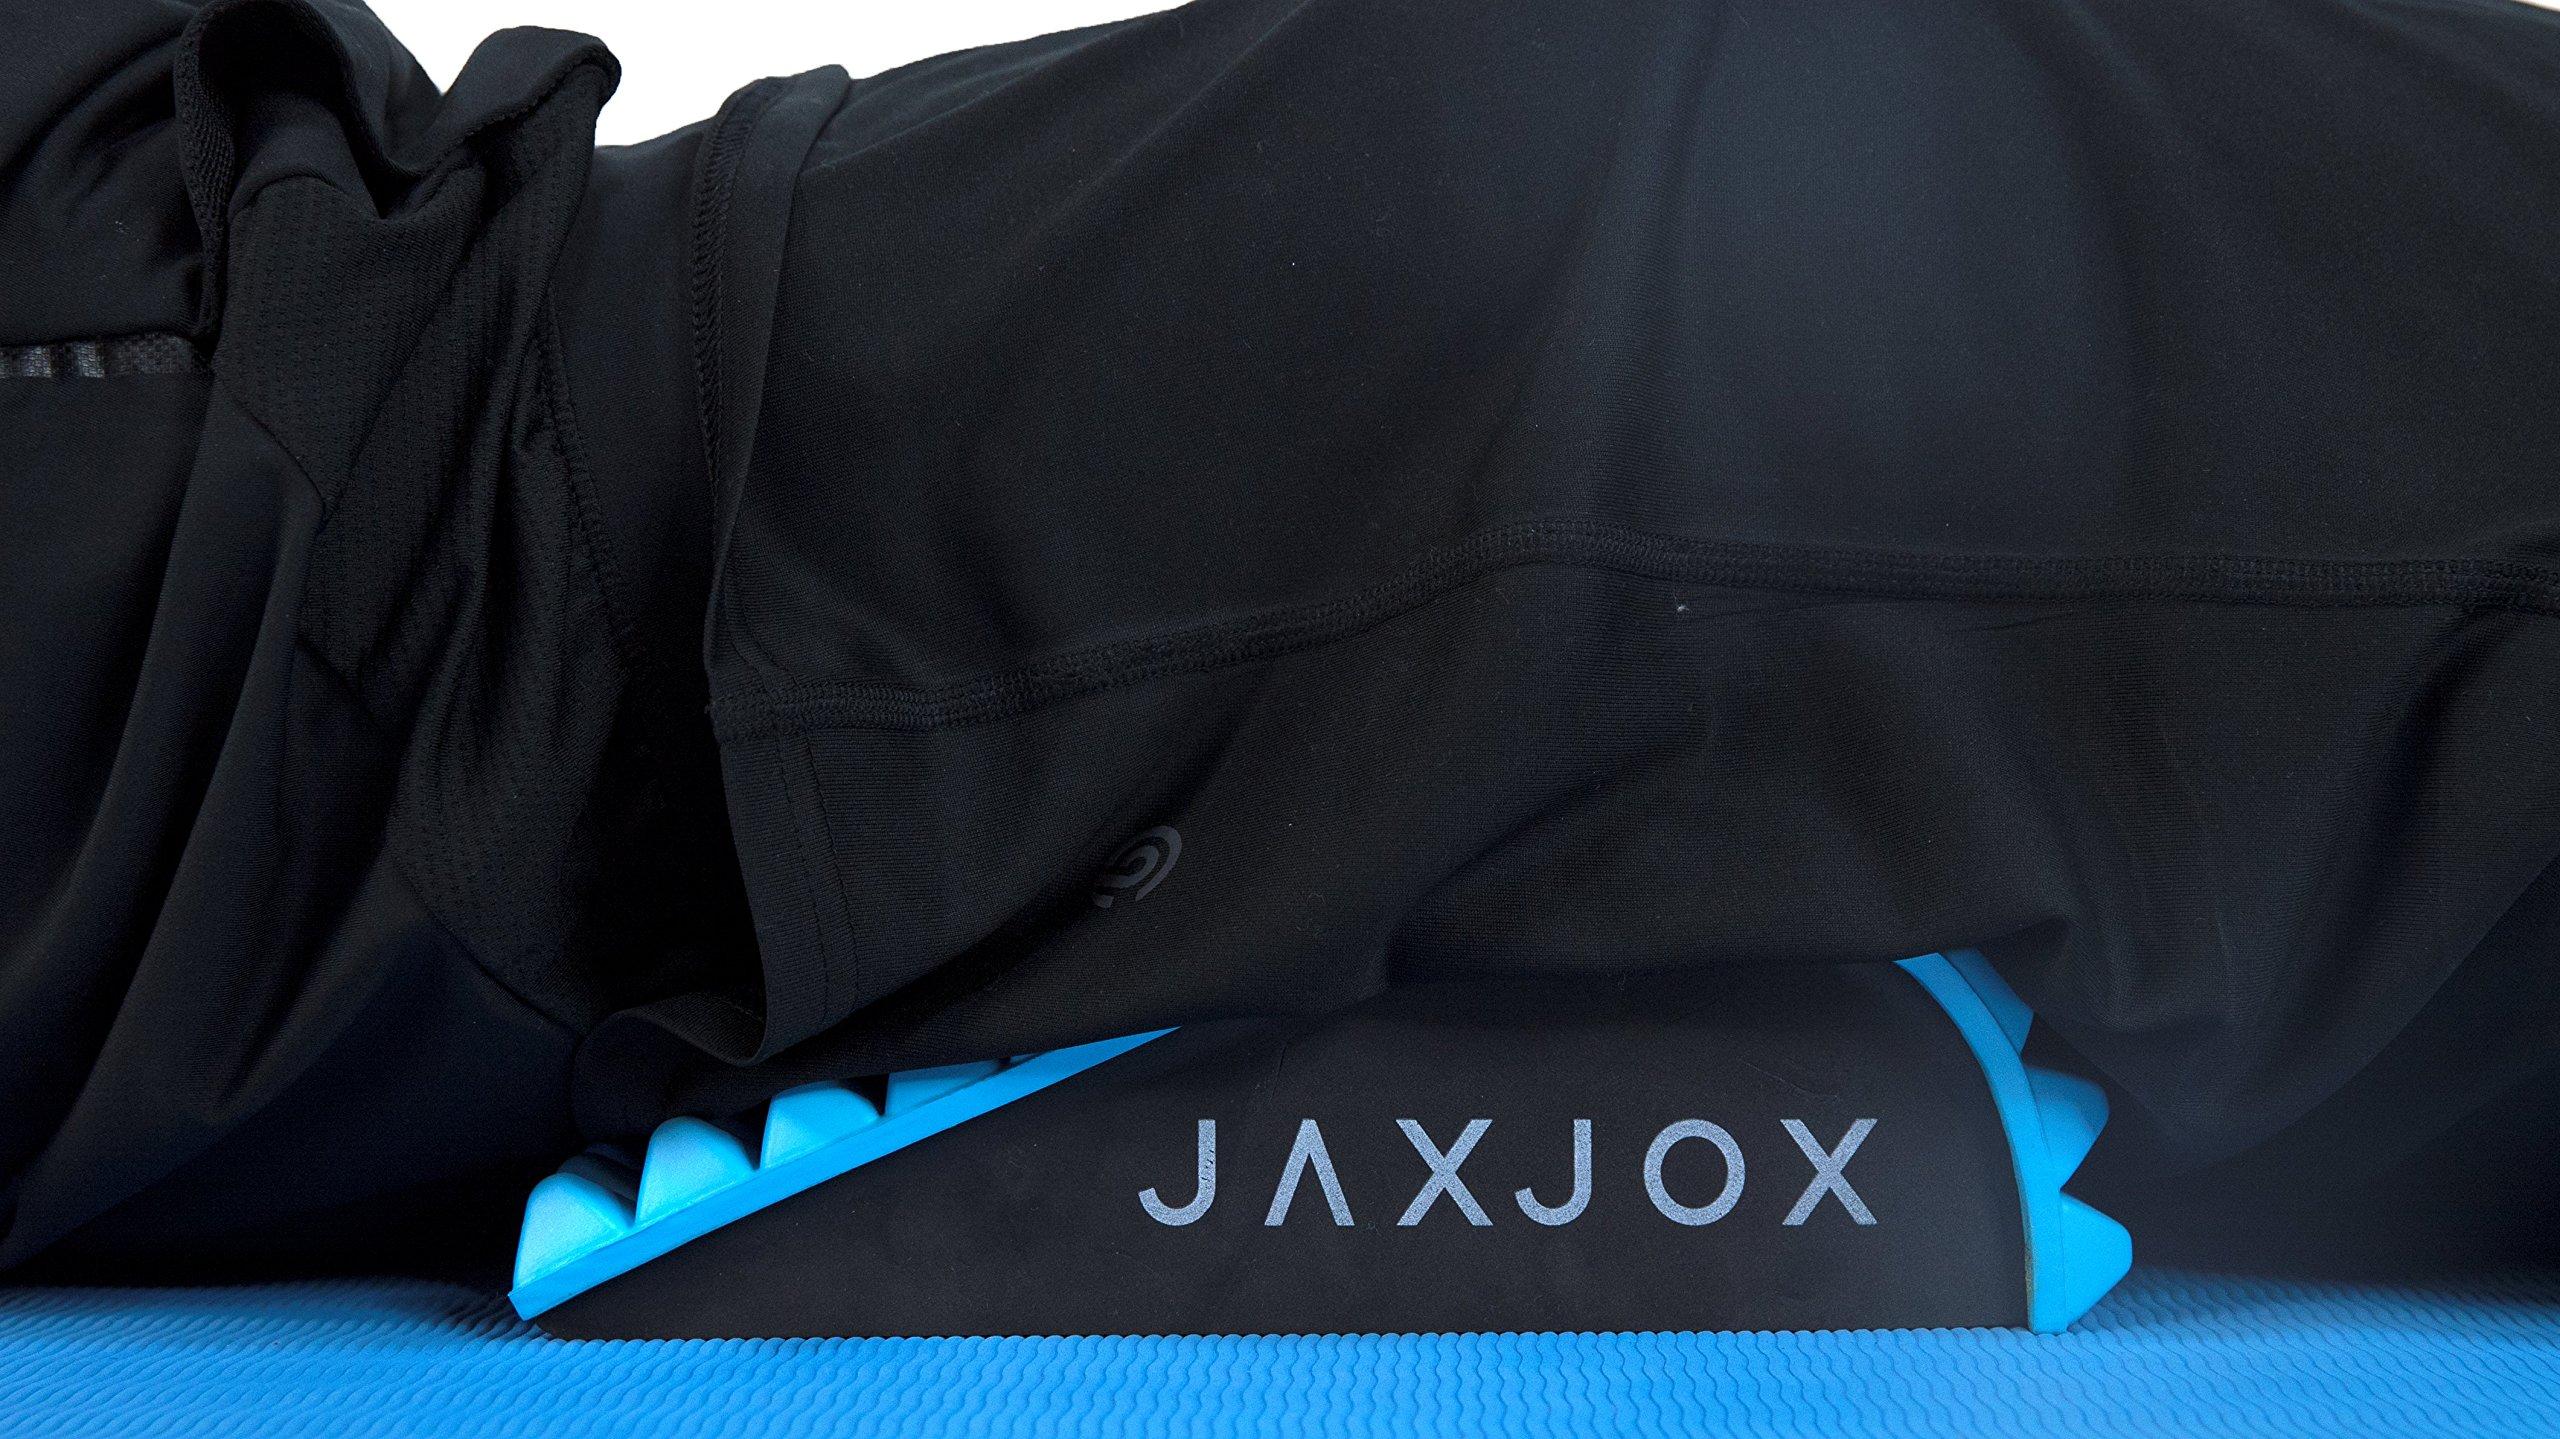 JAXJOX Lumbar Restore Set - Includes: Neck and Back Lumbar Mat and 2 Massage Balls